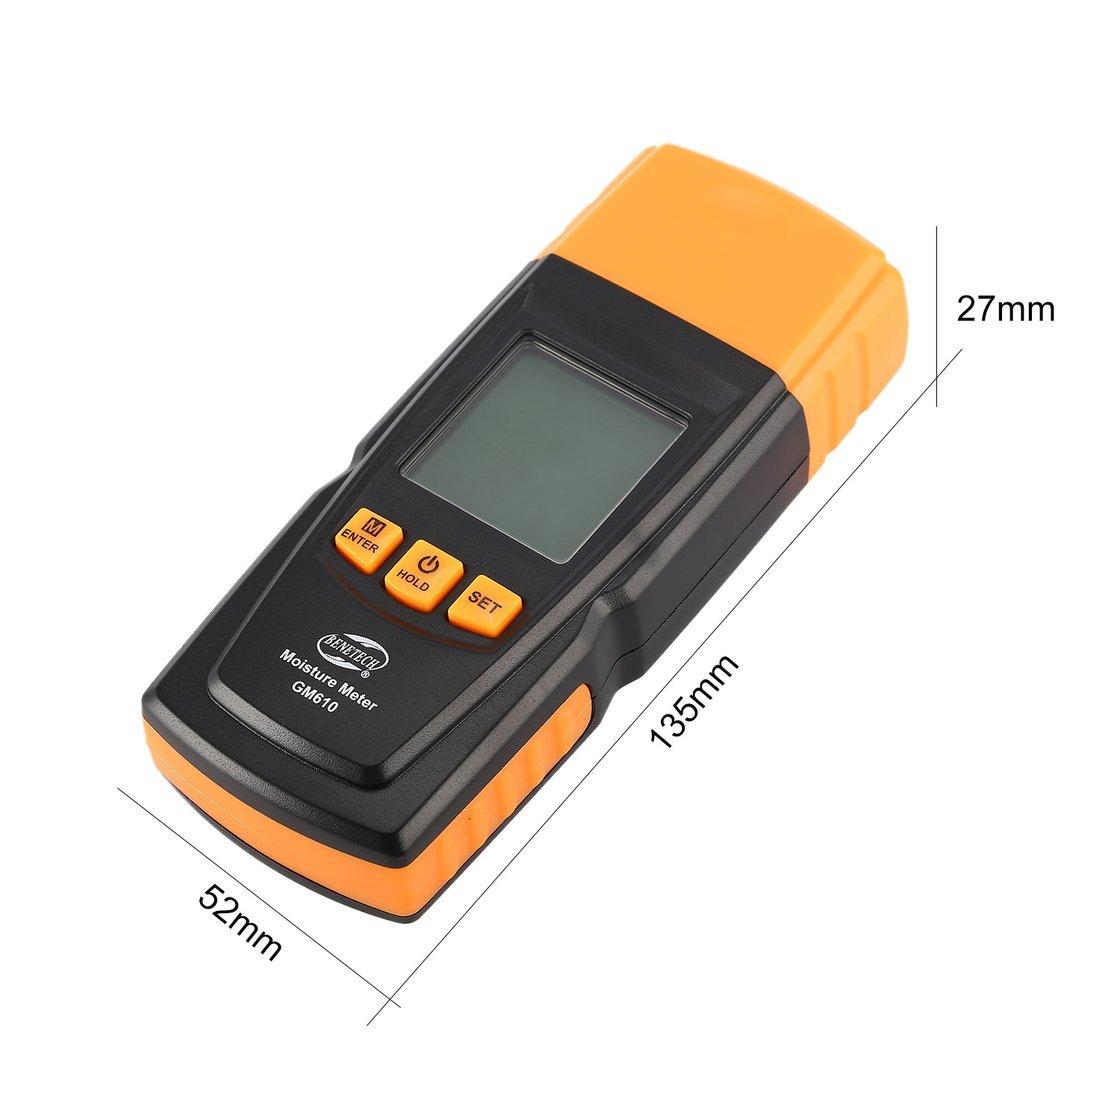 BENETECH GM605 Pantalla LCD digital Medidor de humedad de madera Probador de humedad Timber Tree Tree Damp Detector 2 Pines Hygrometer